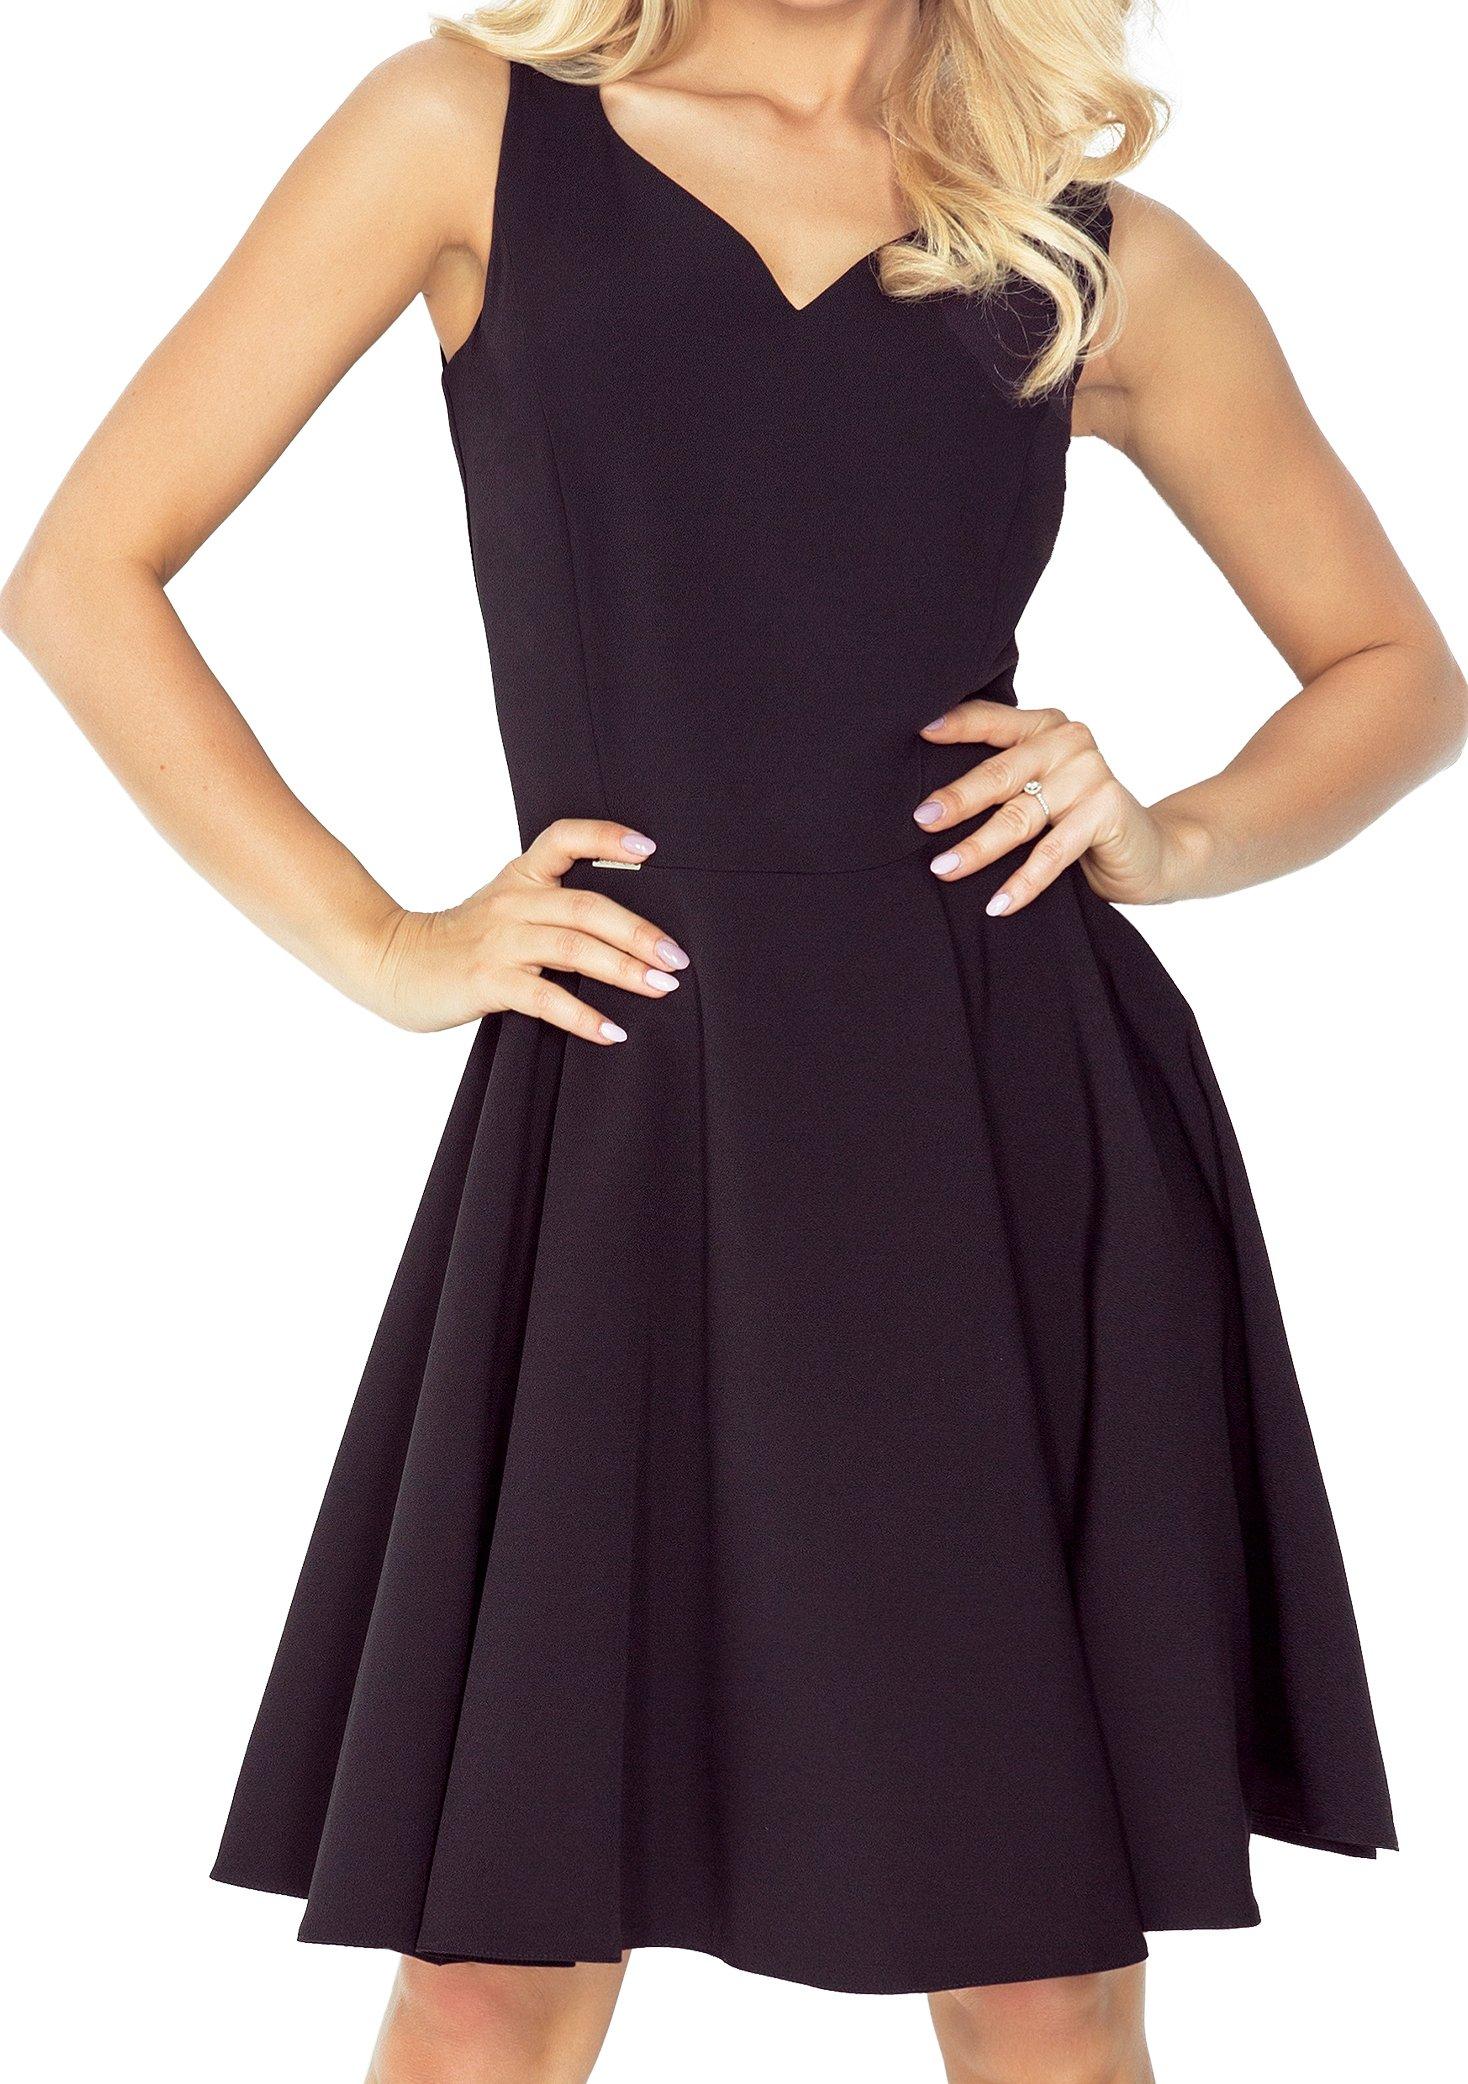 b771e572ac PIĘKNA Sukienka NA WESELE ROZKLOSZOWANA 114-9 S 36 - 7211247107 ...